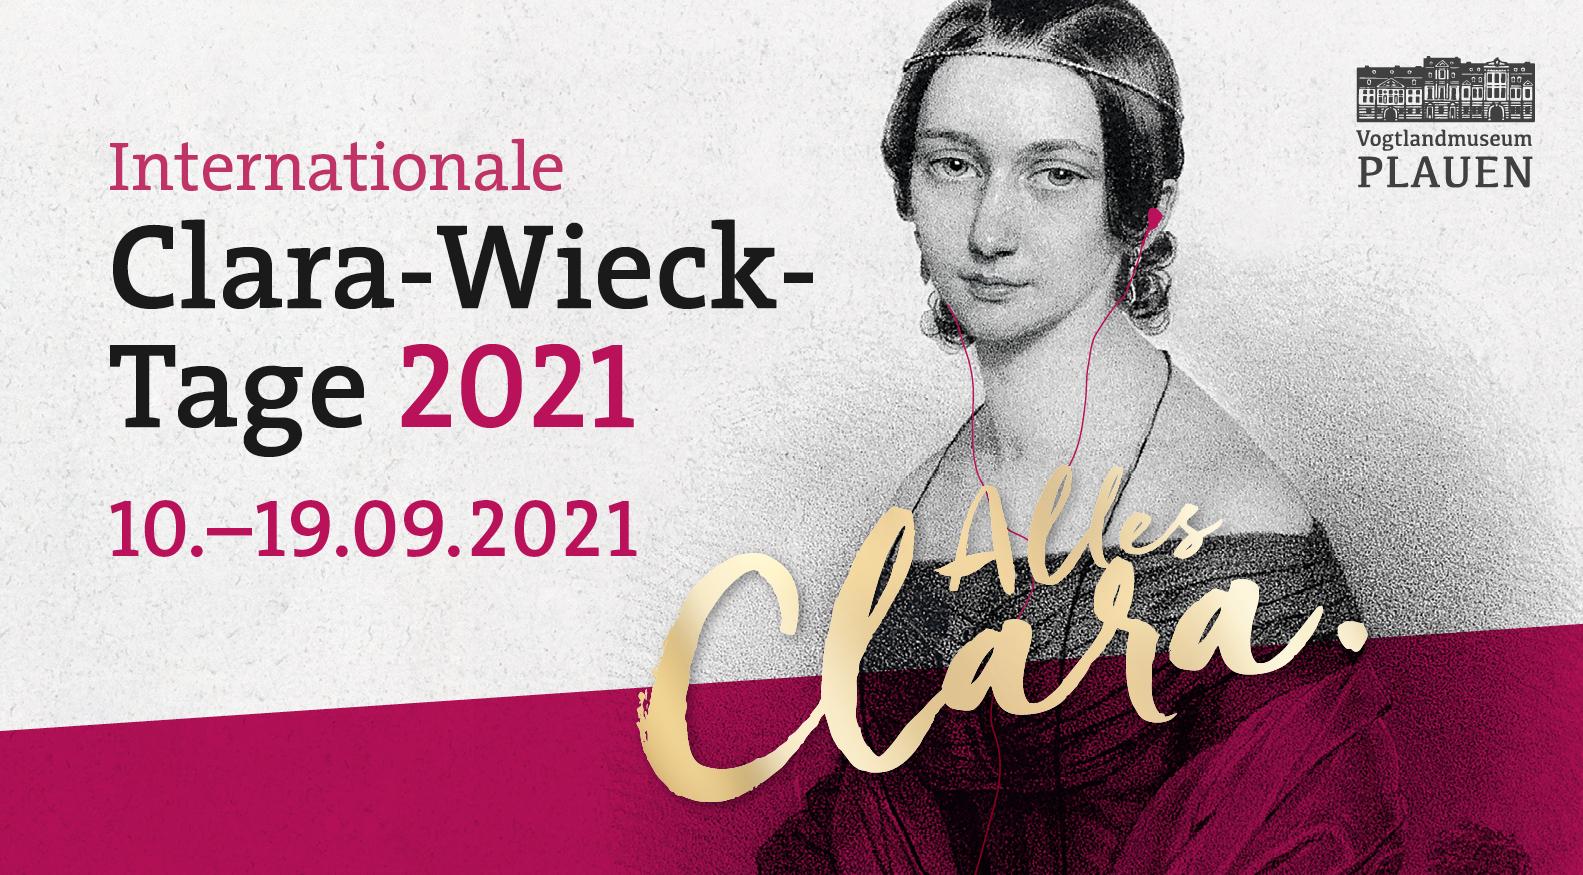 Internationale Clara-Wieck-Tage 2021